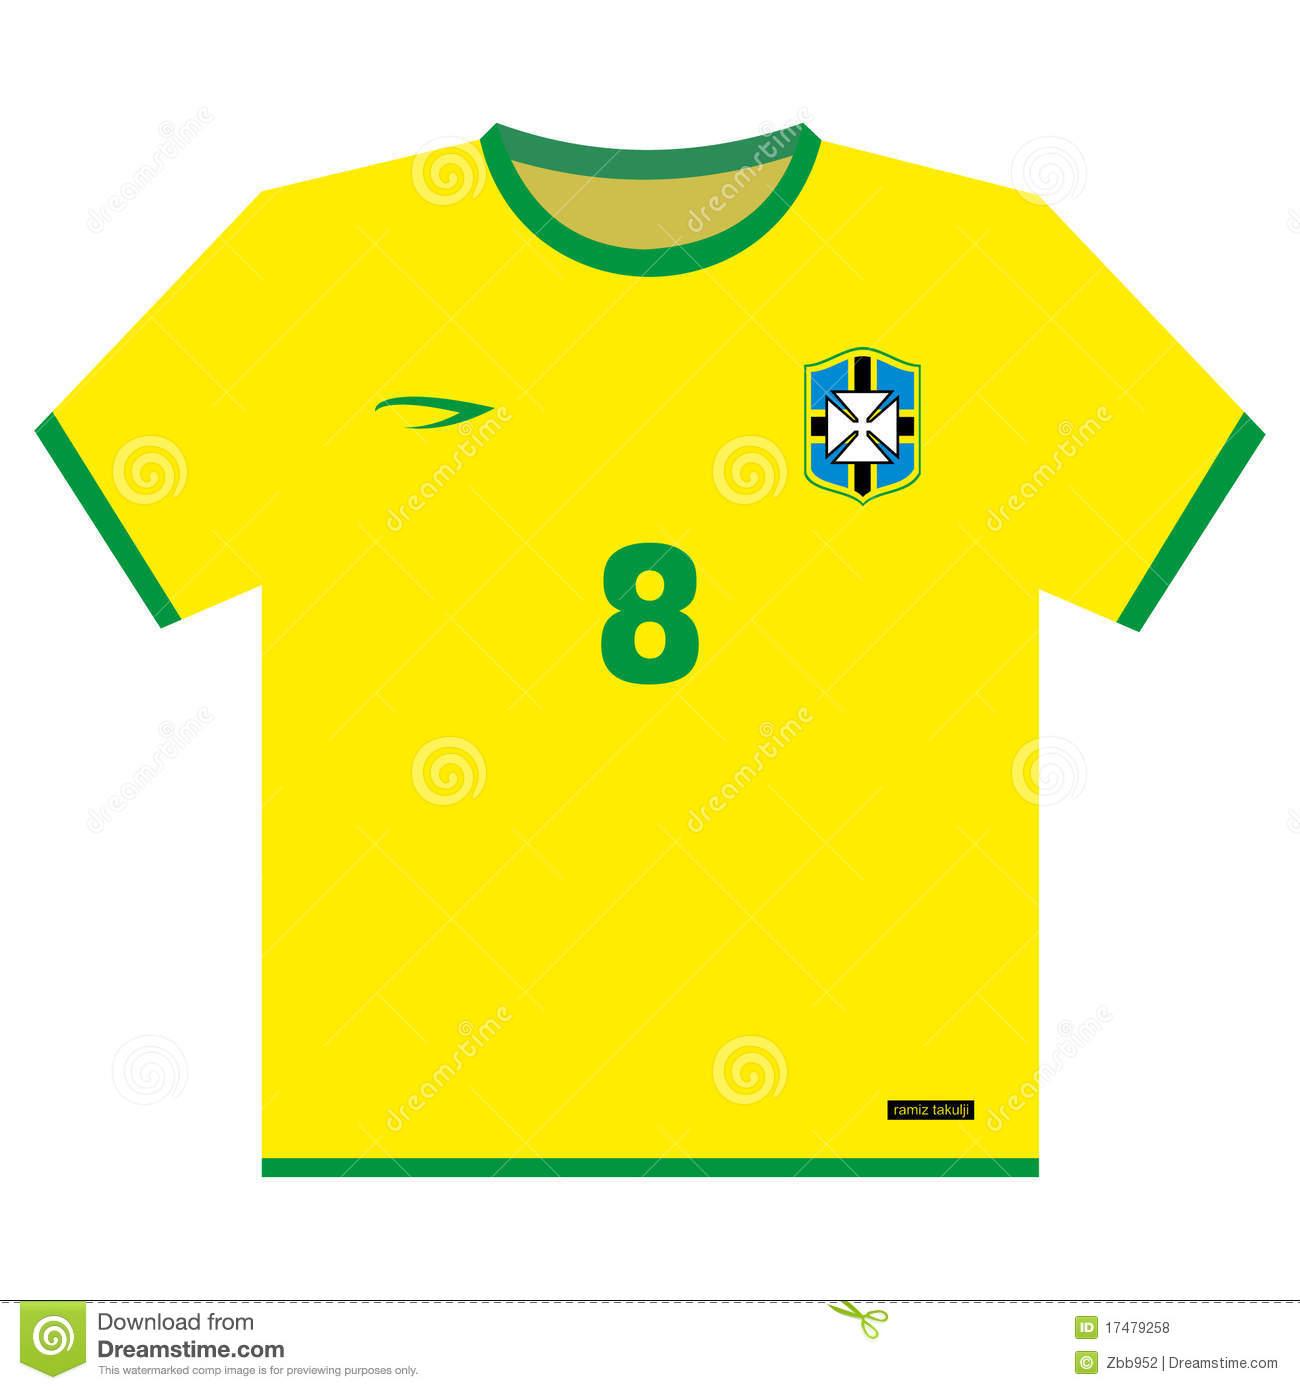 clipart football shirts - photo #15